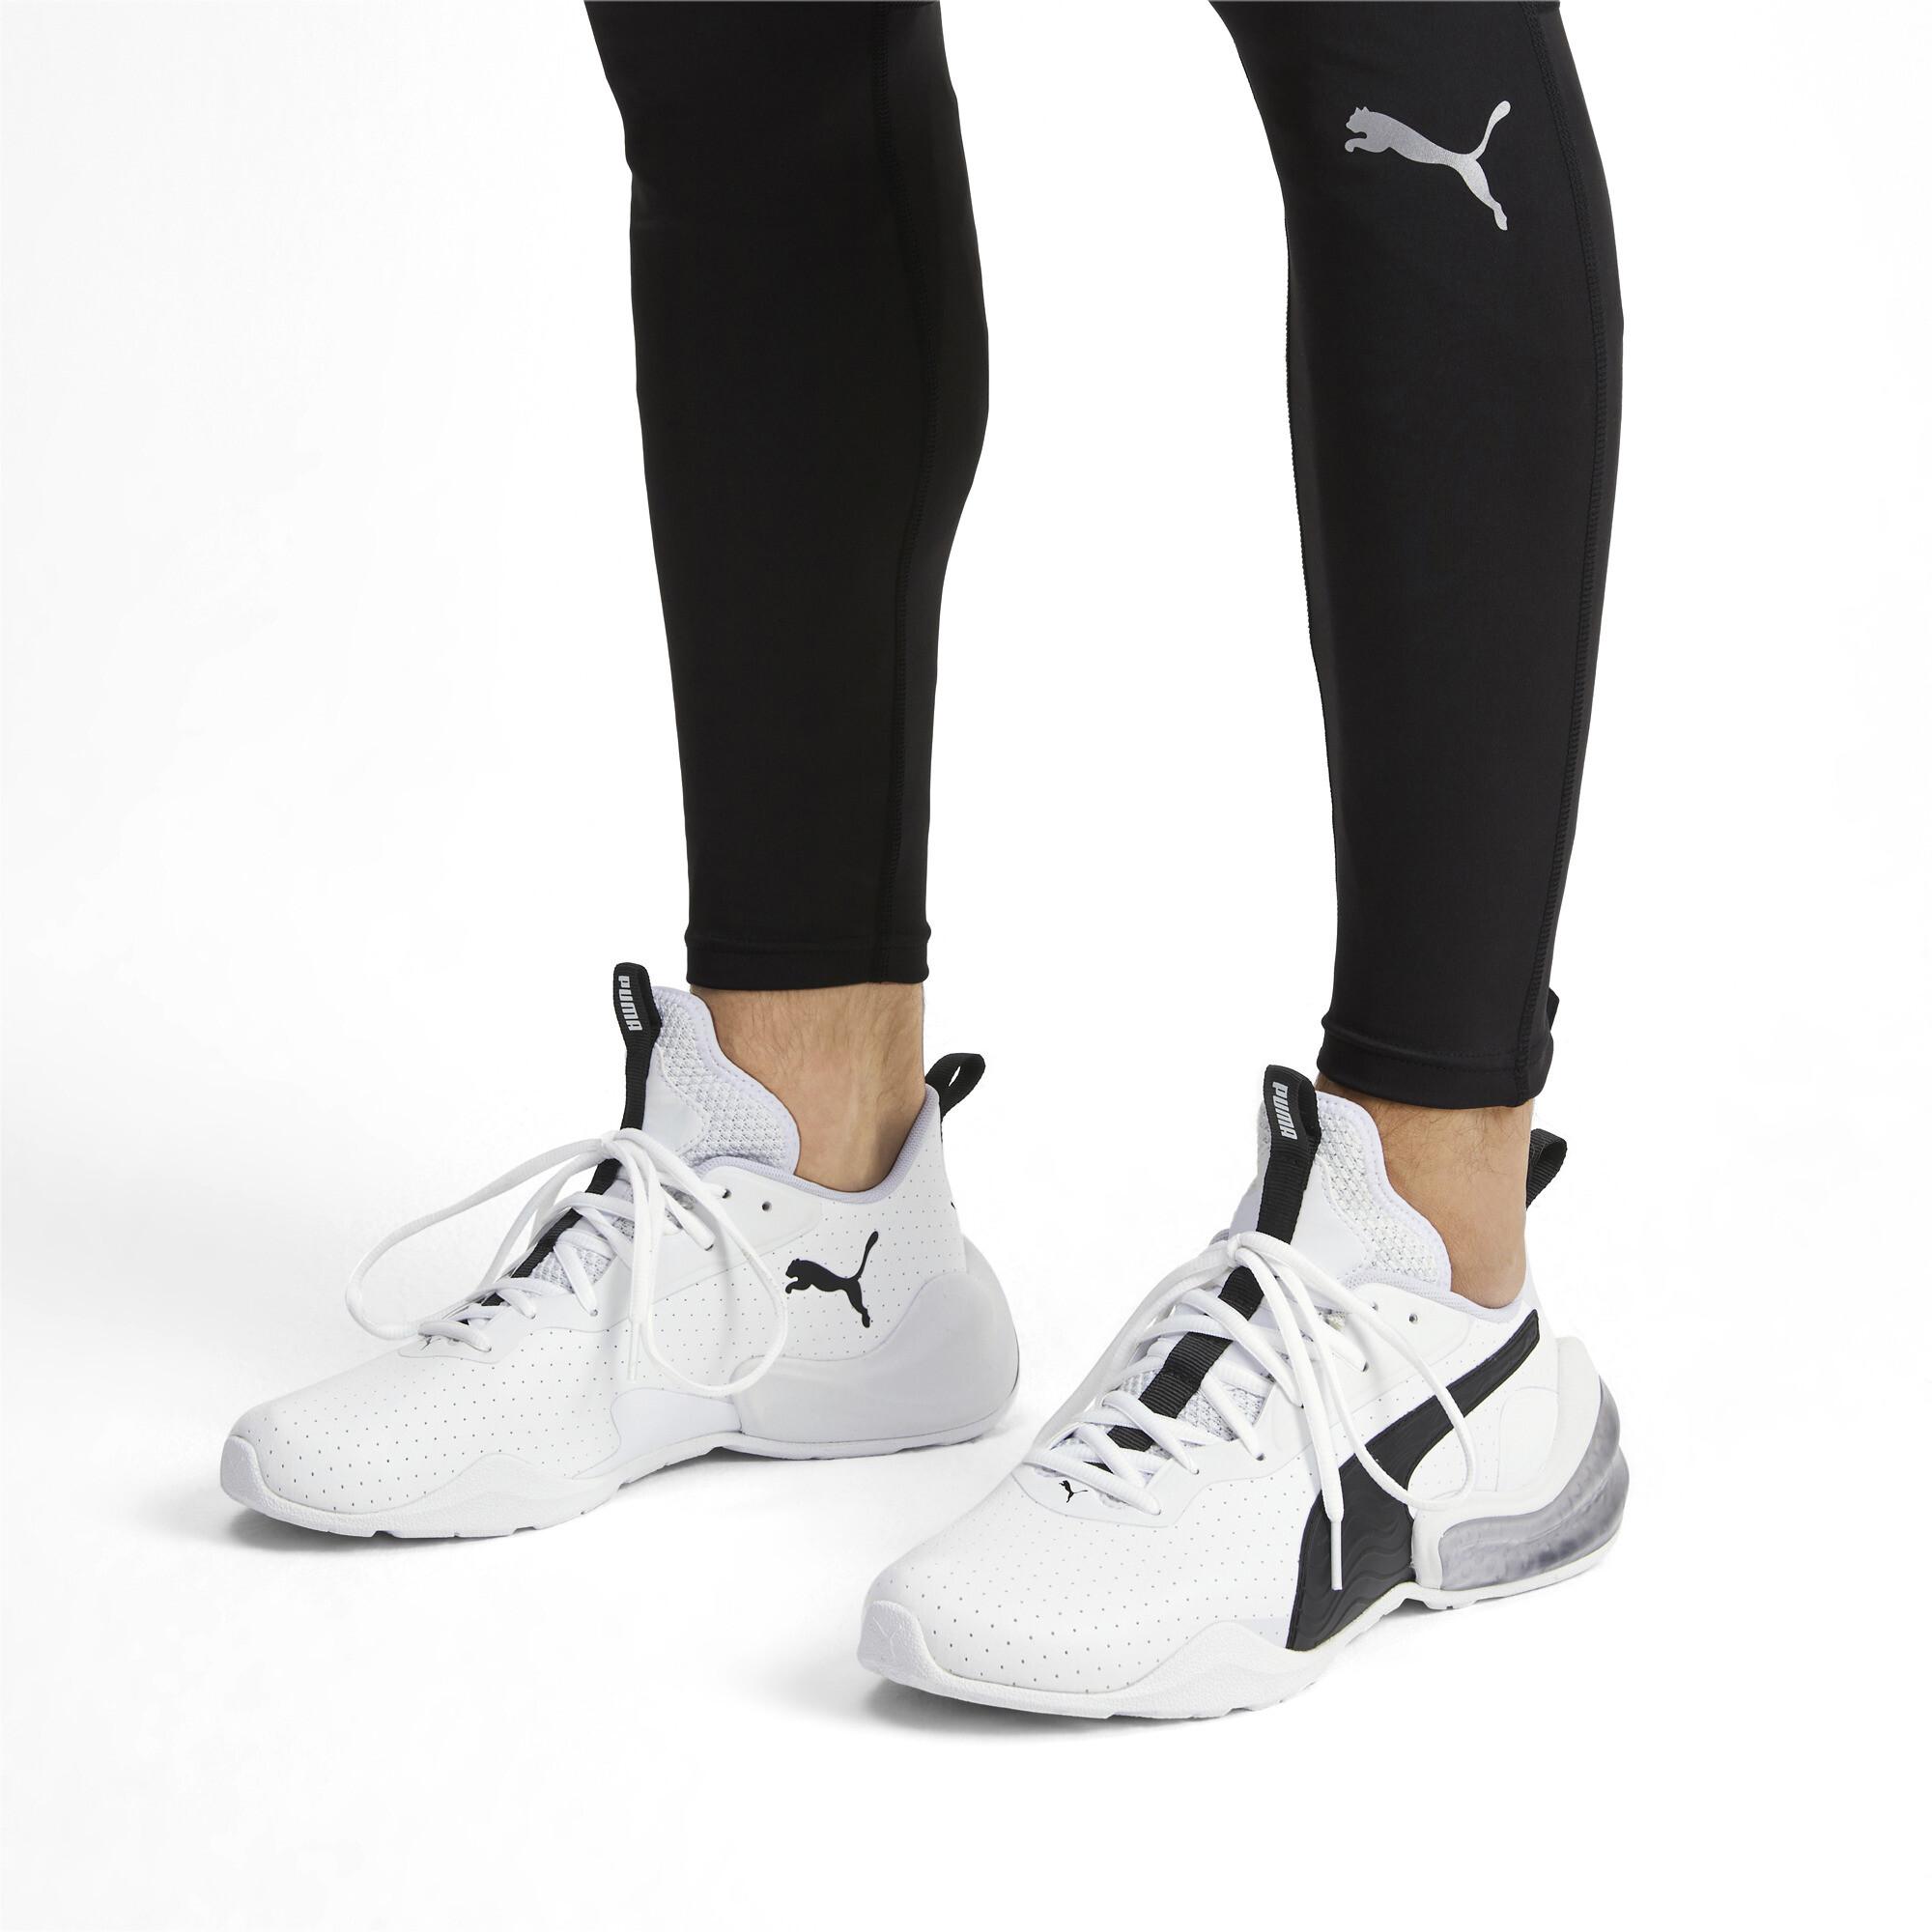 PUMA-Men-039-s-LQDCELL-Challenge-Perf-Training-Shoes thumbnail 5